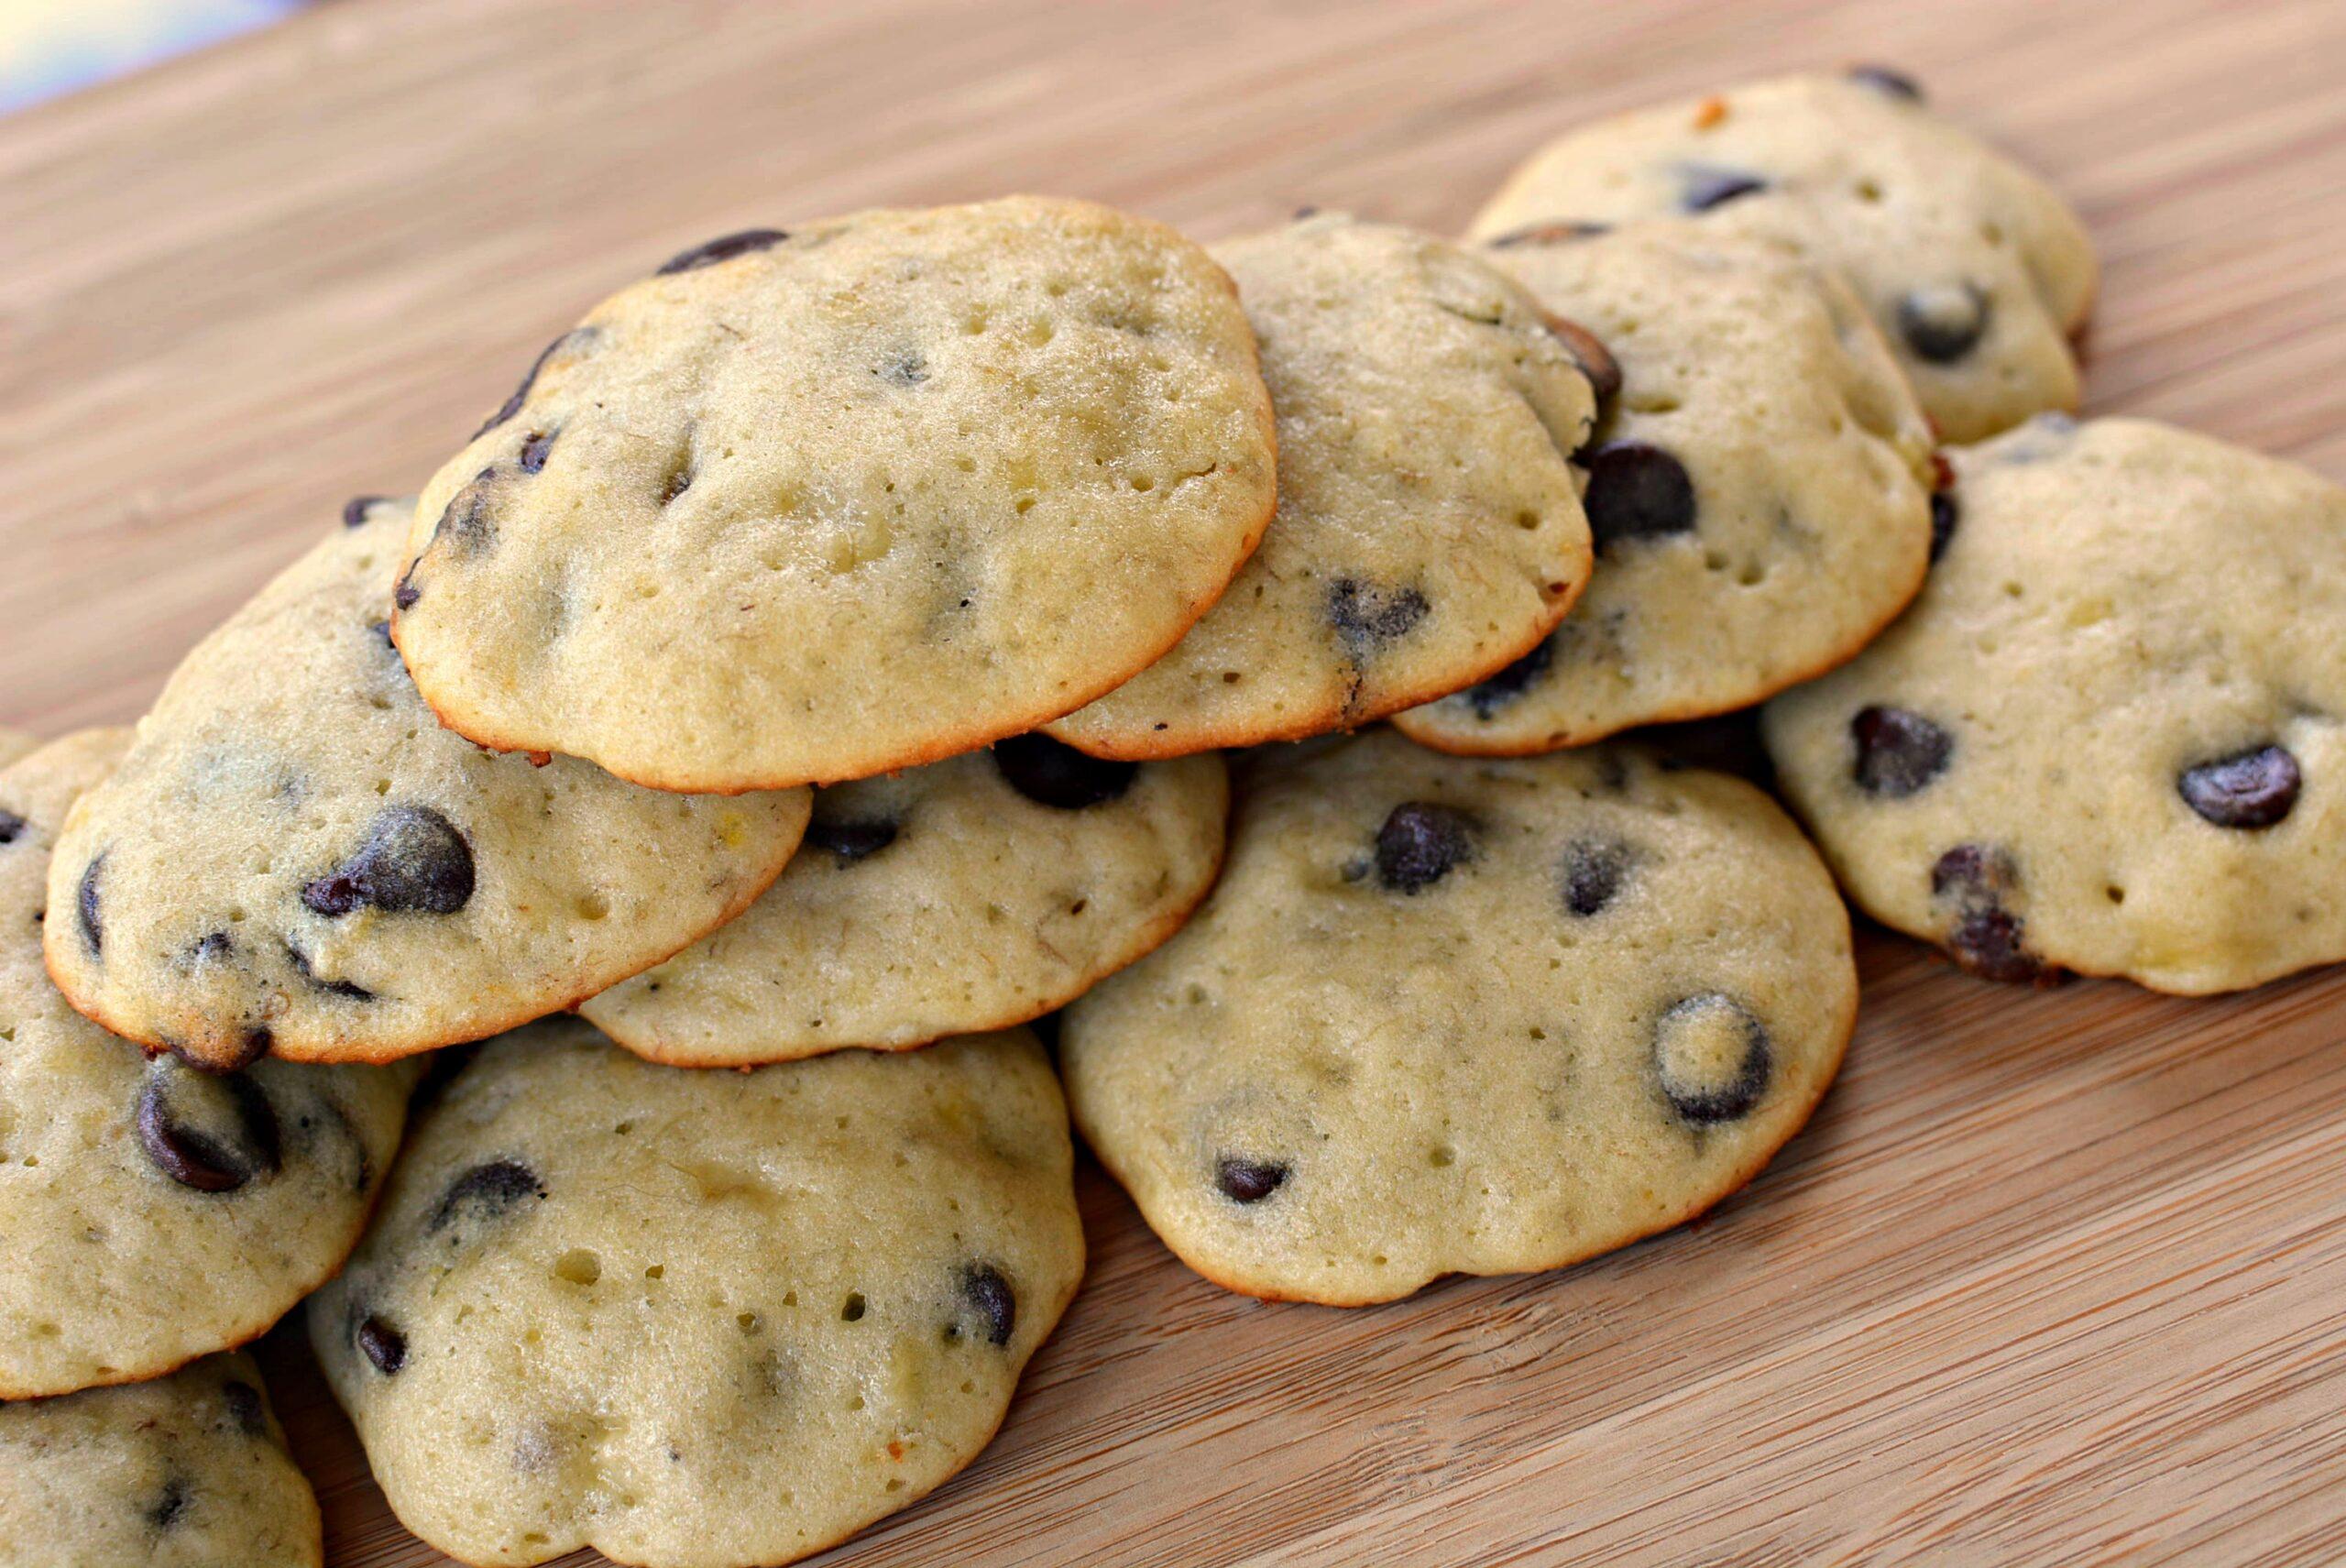 Banana Chocolate Chip Cookies | The Cookin Chicks